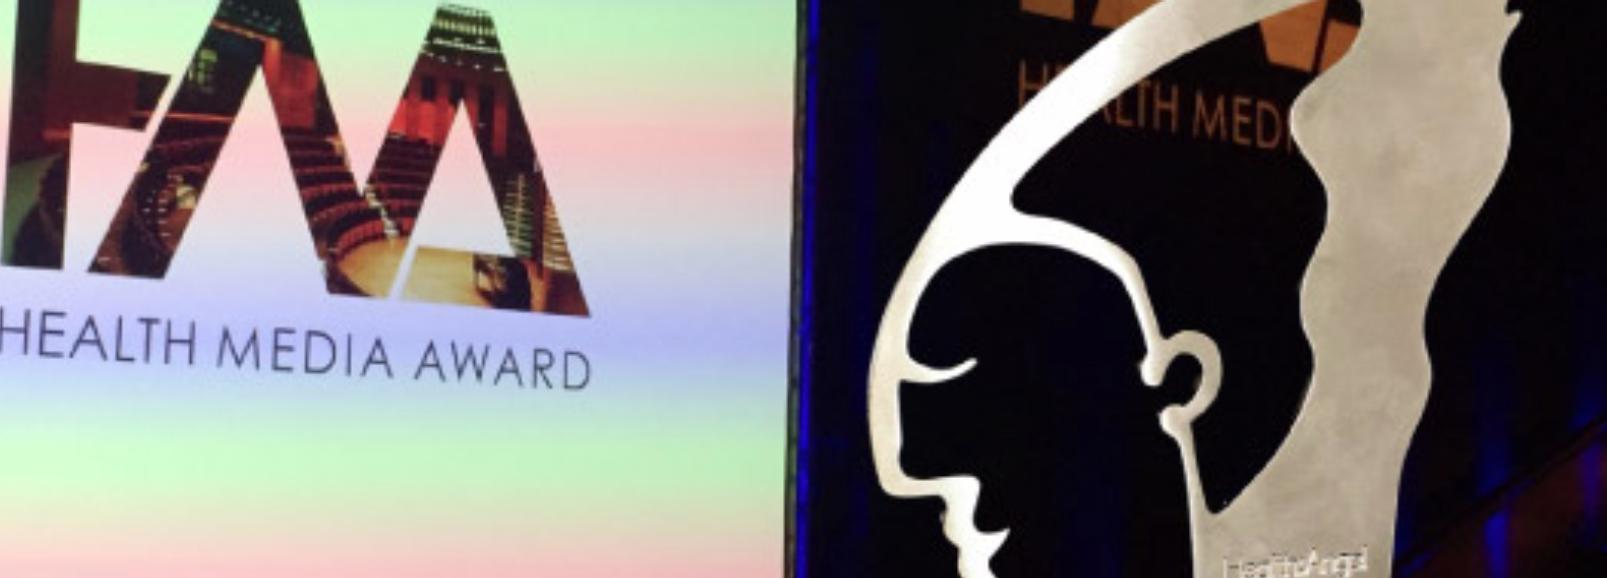 Uhura gewinnt Health Media Awards 2015